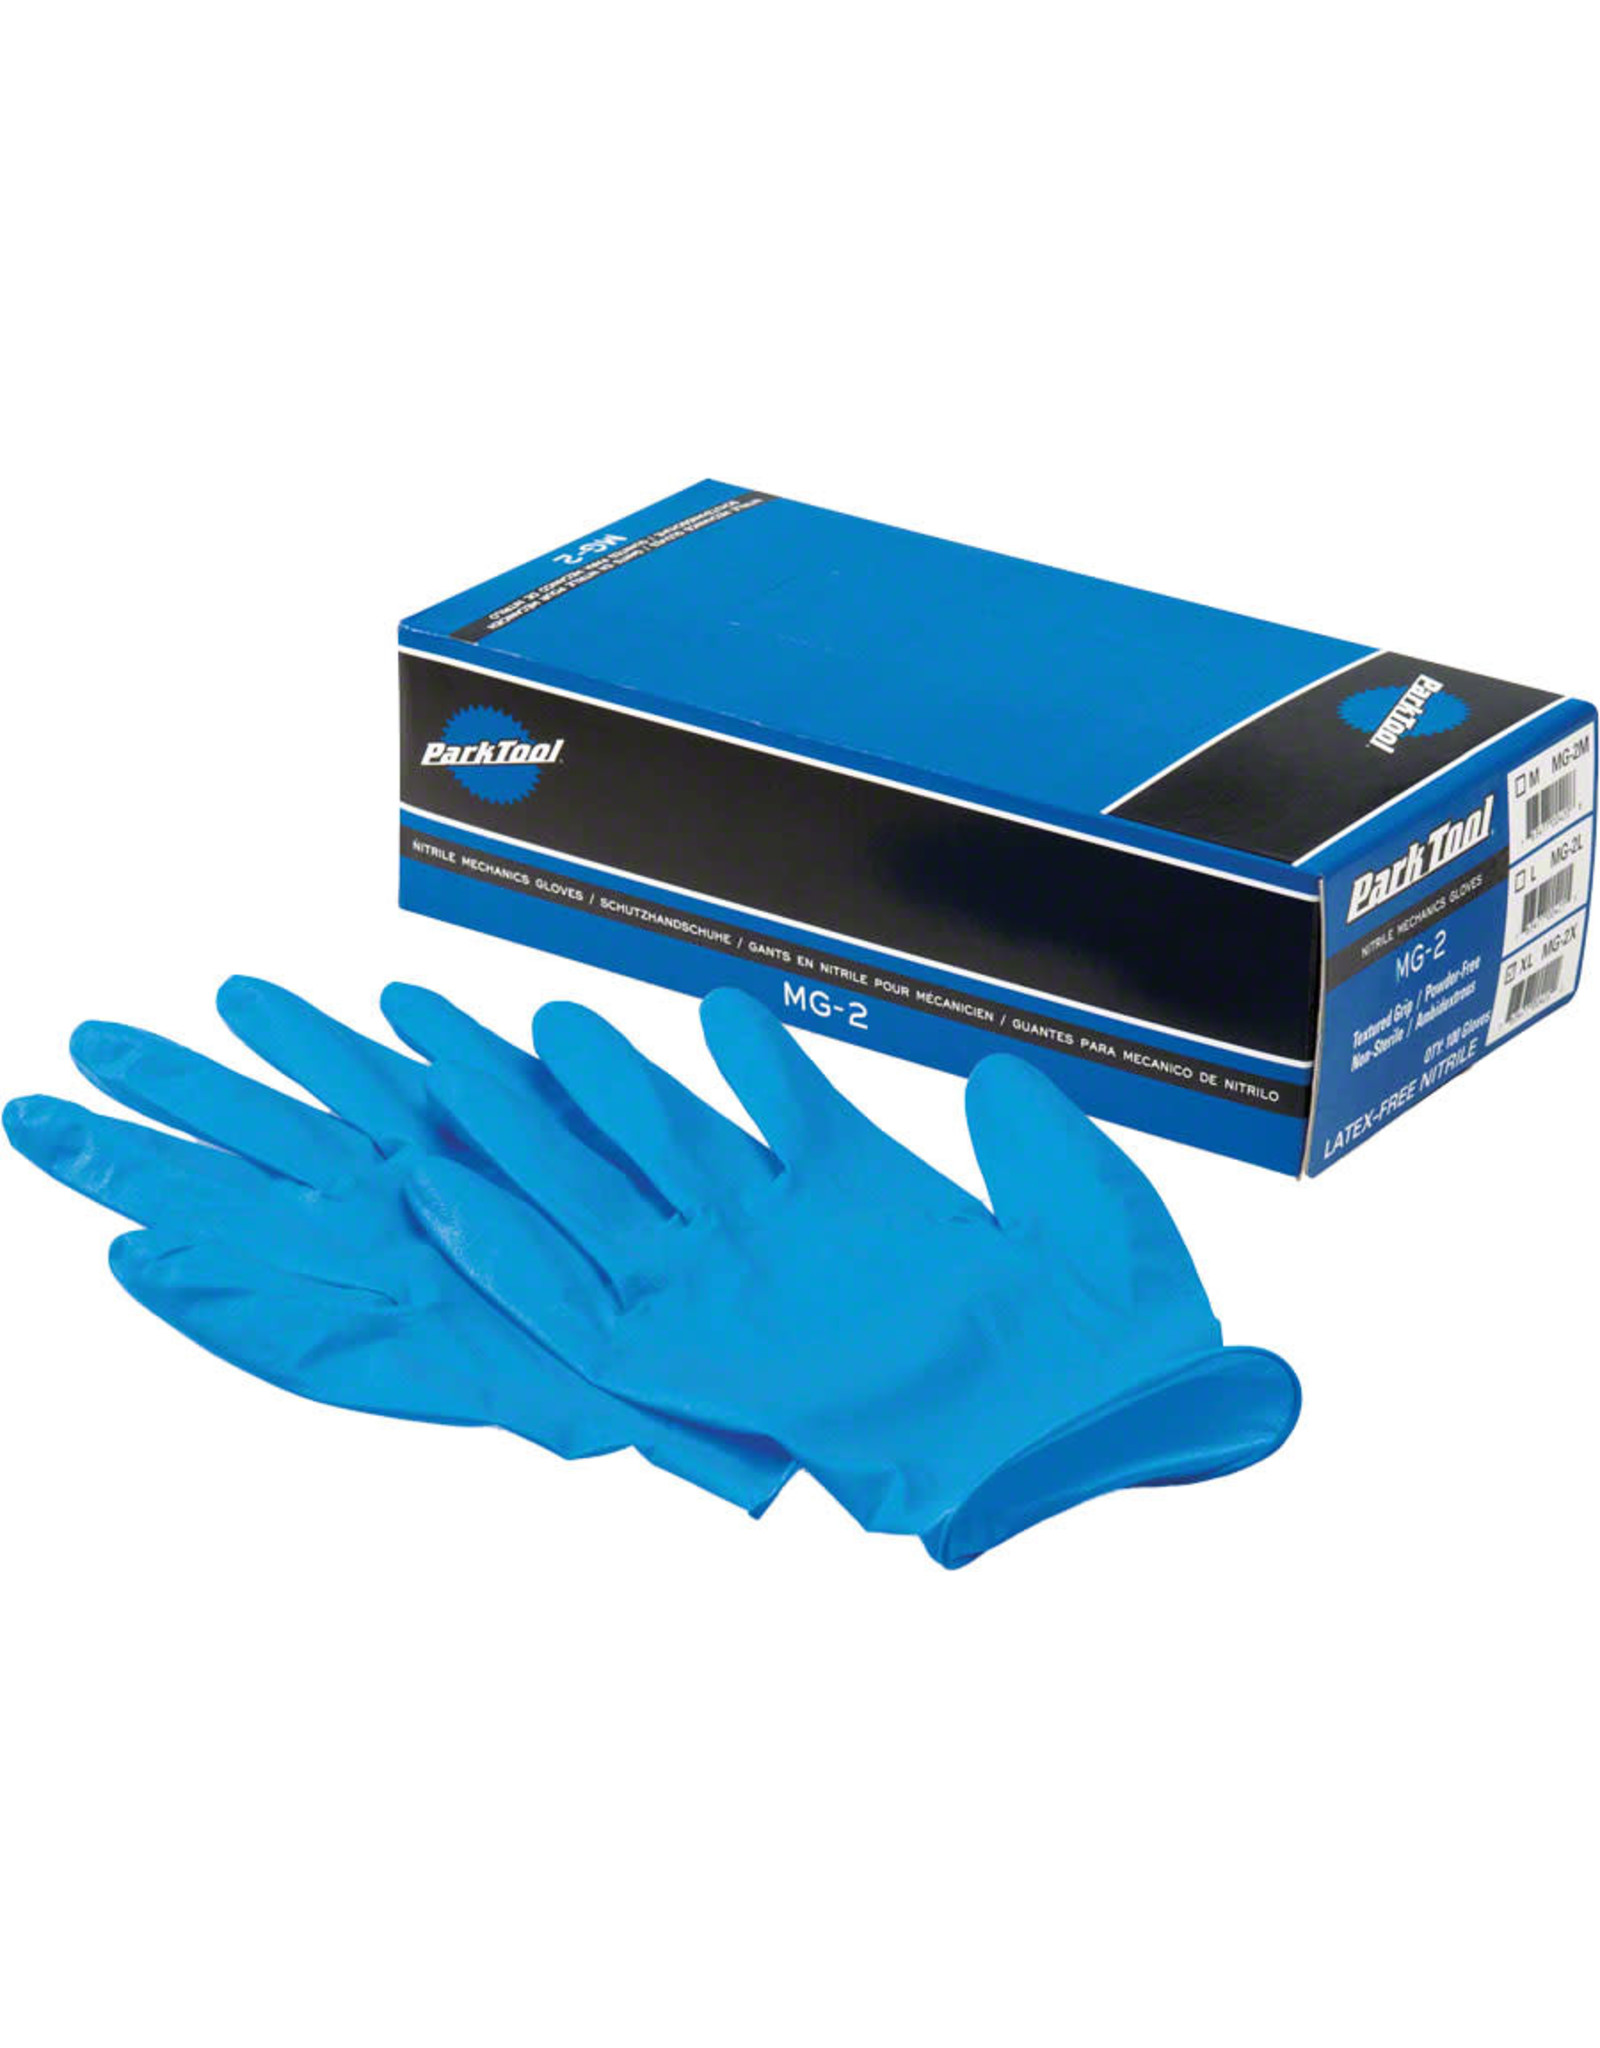 Park Tool Park Tool MG-2X Nitrile Mechanic Gloves: Xlarge, Blue